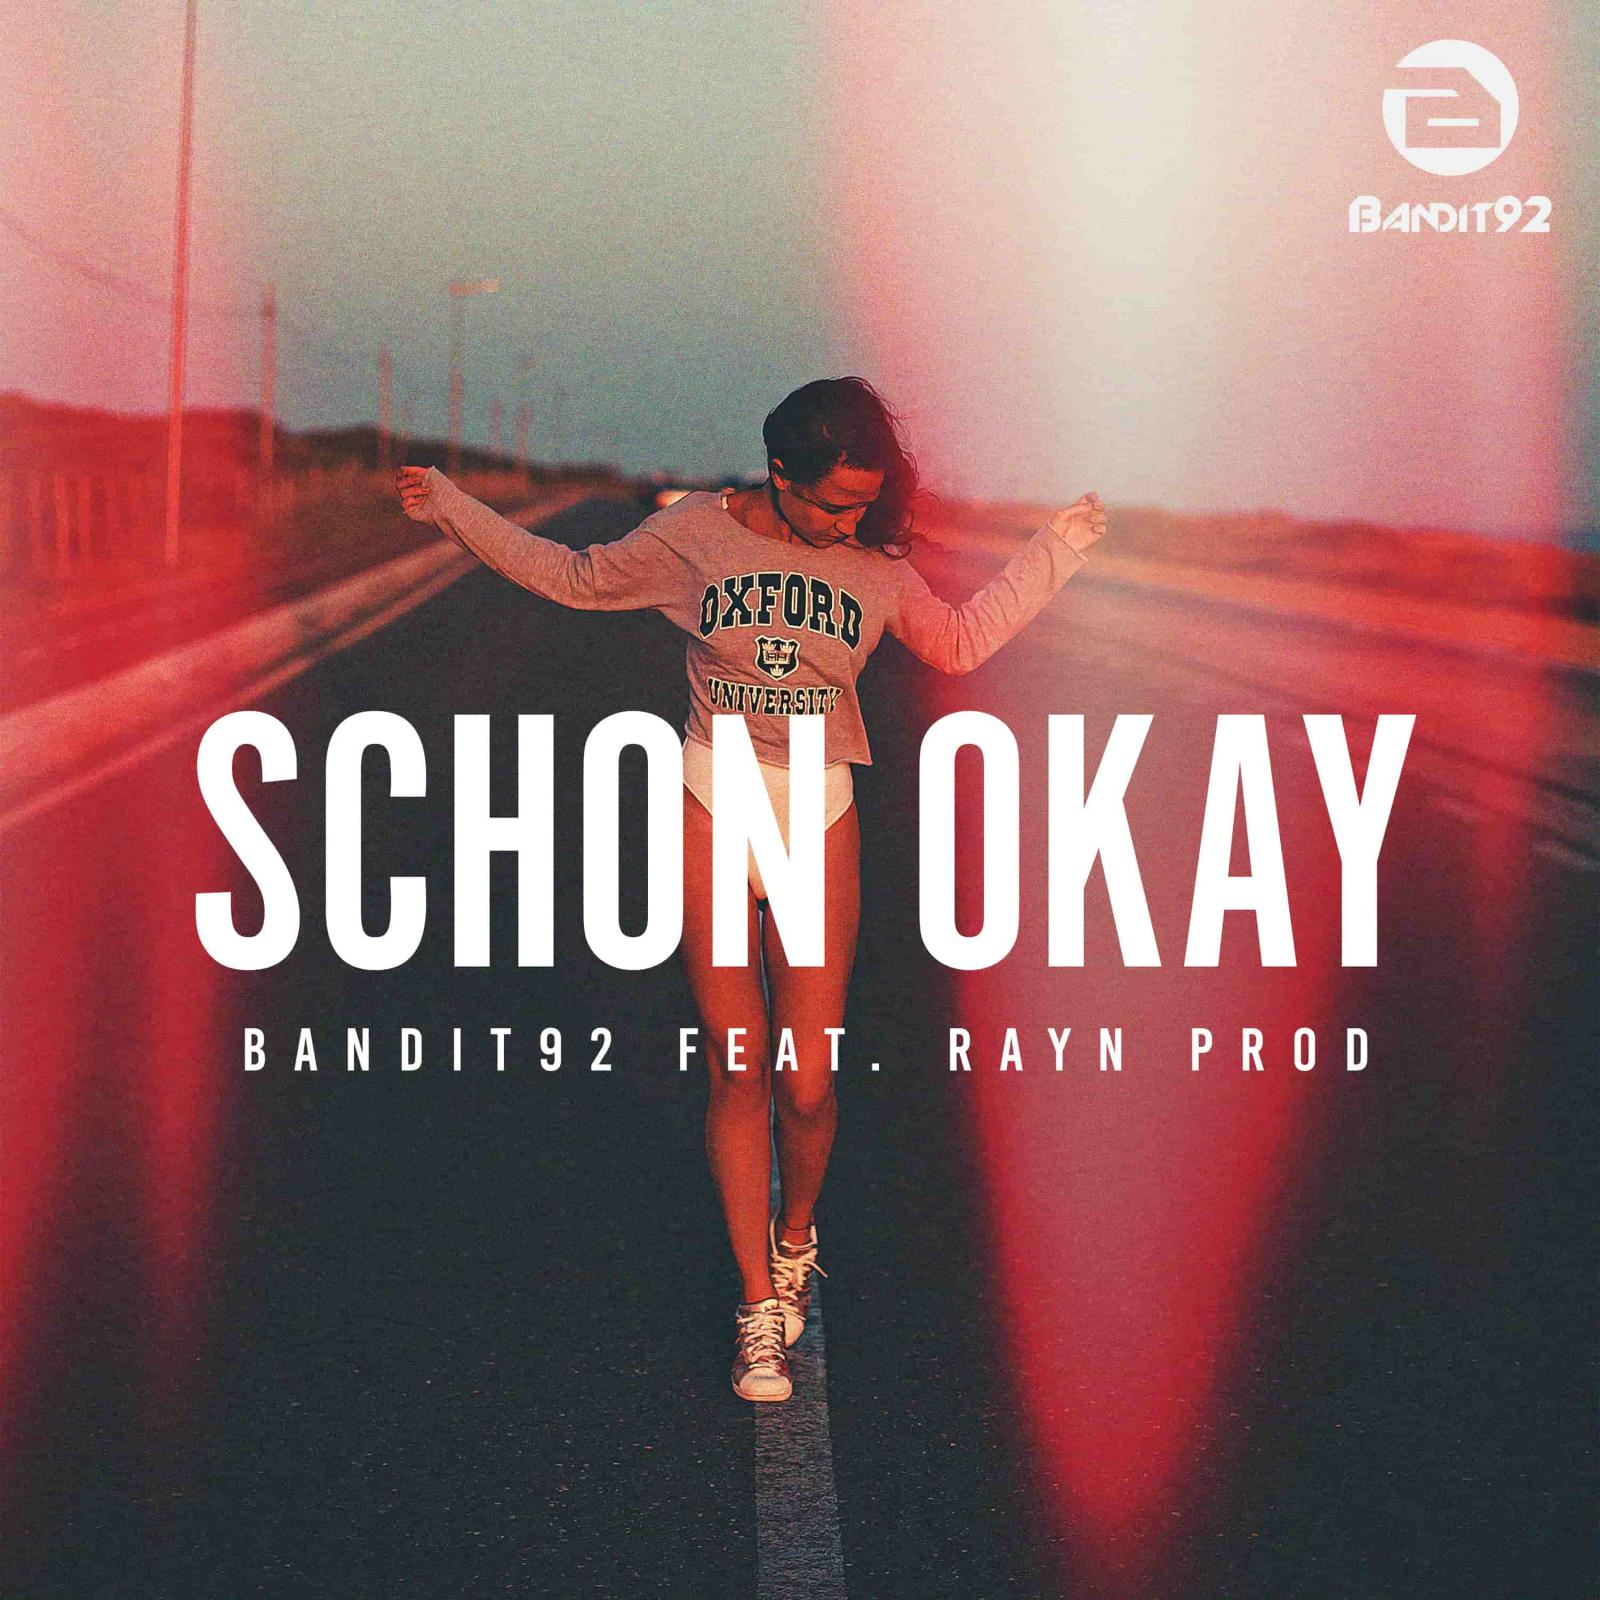 Upcoming: Bandit92, Rayn Prod - Schon Okay